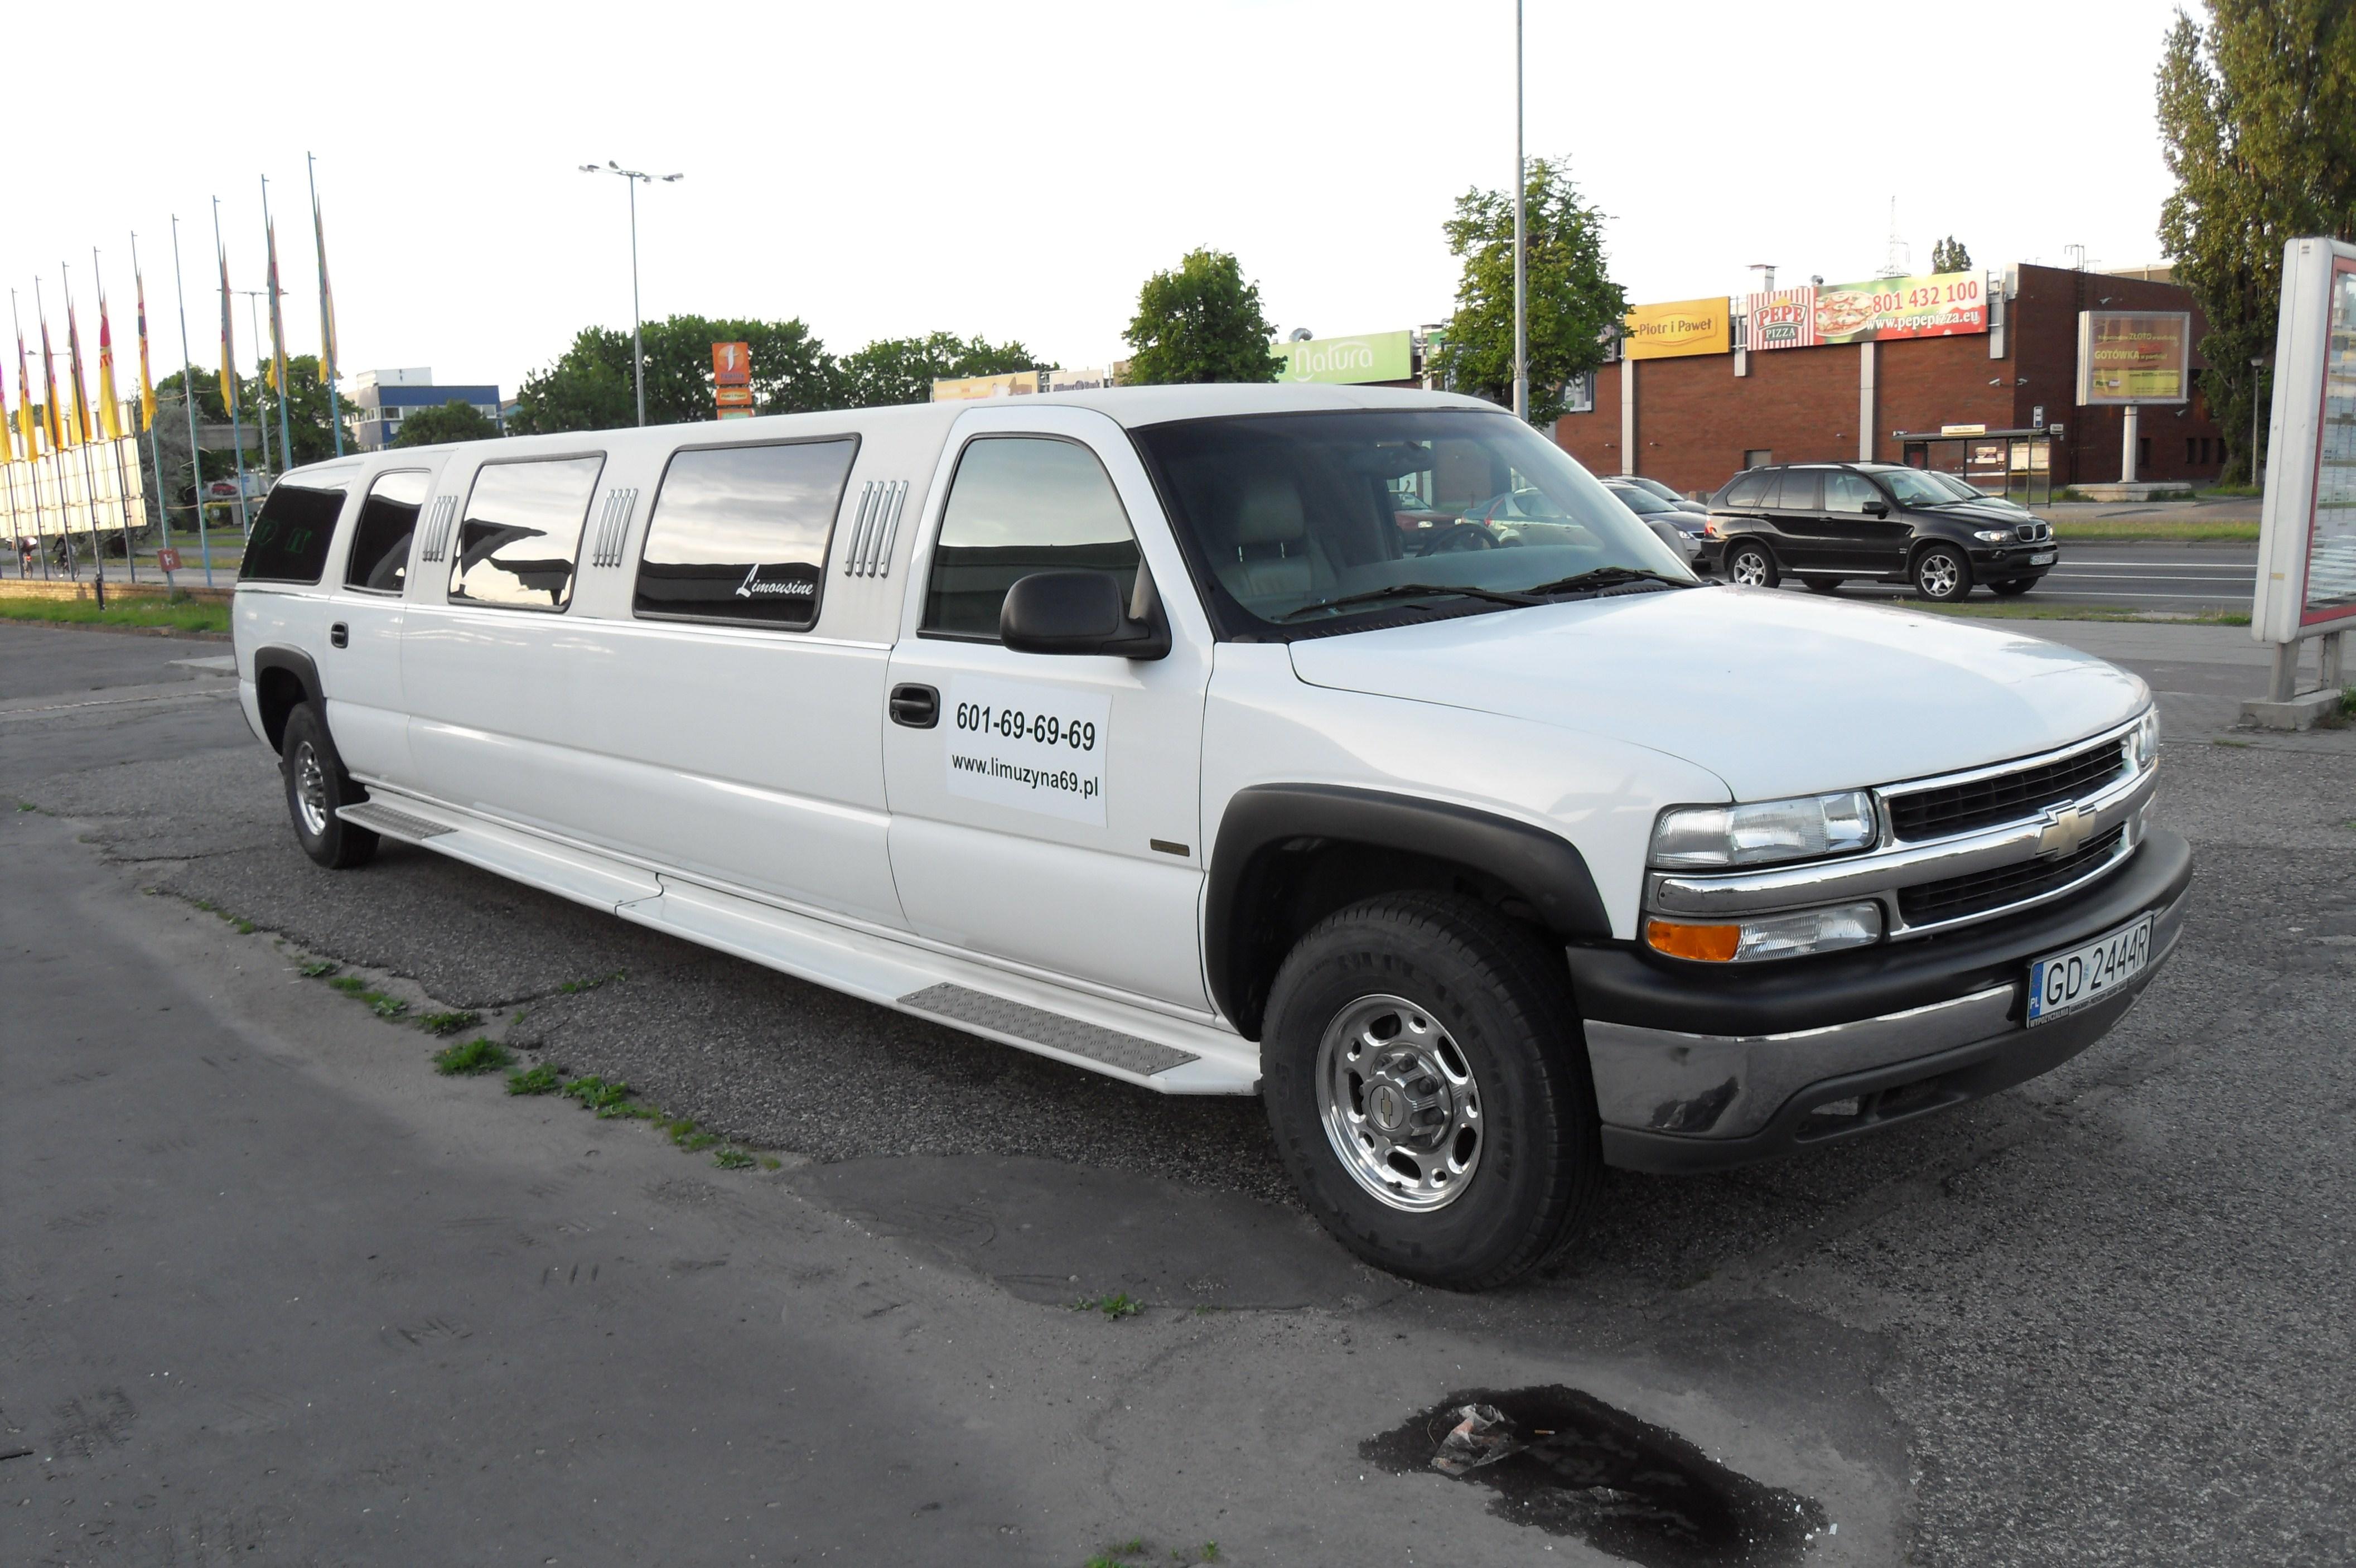 2 Person Car >> File:Chevrolet SUV long.JPG - Wikimedia Commons